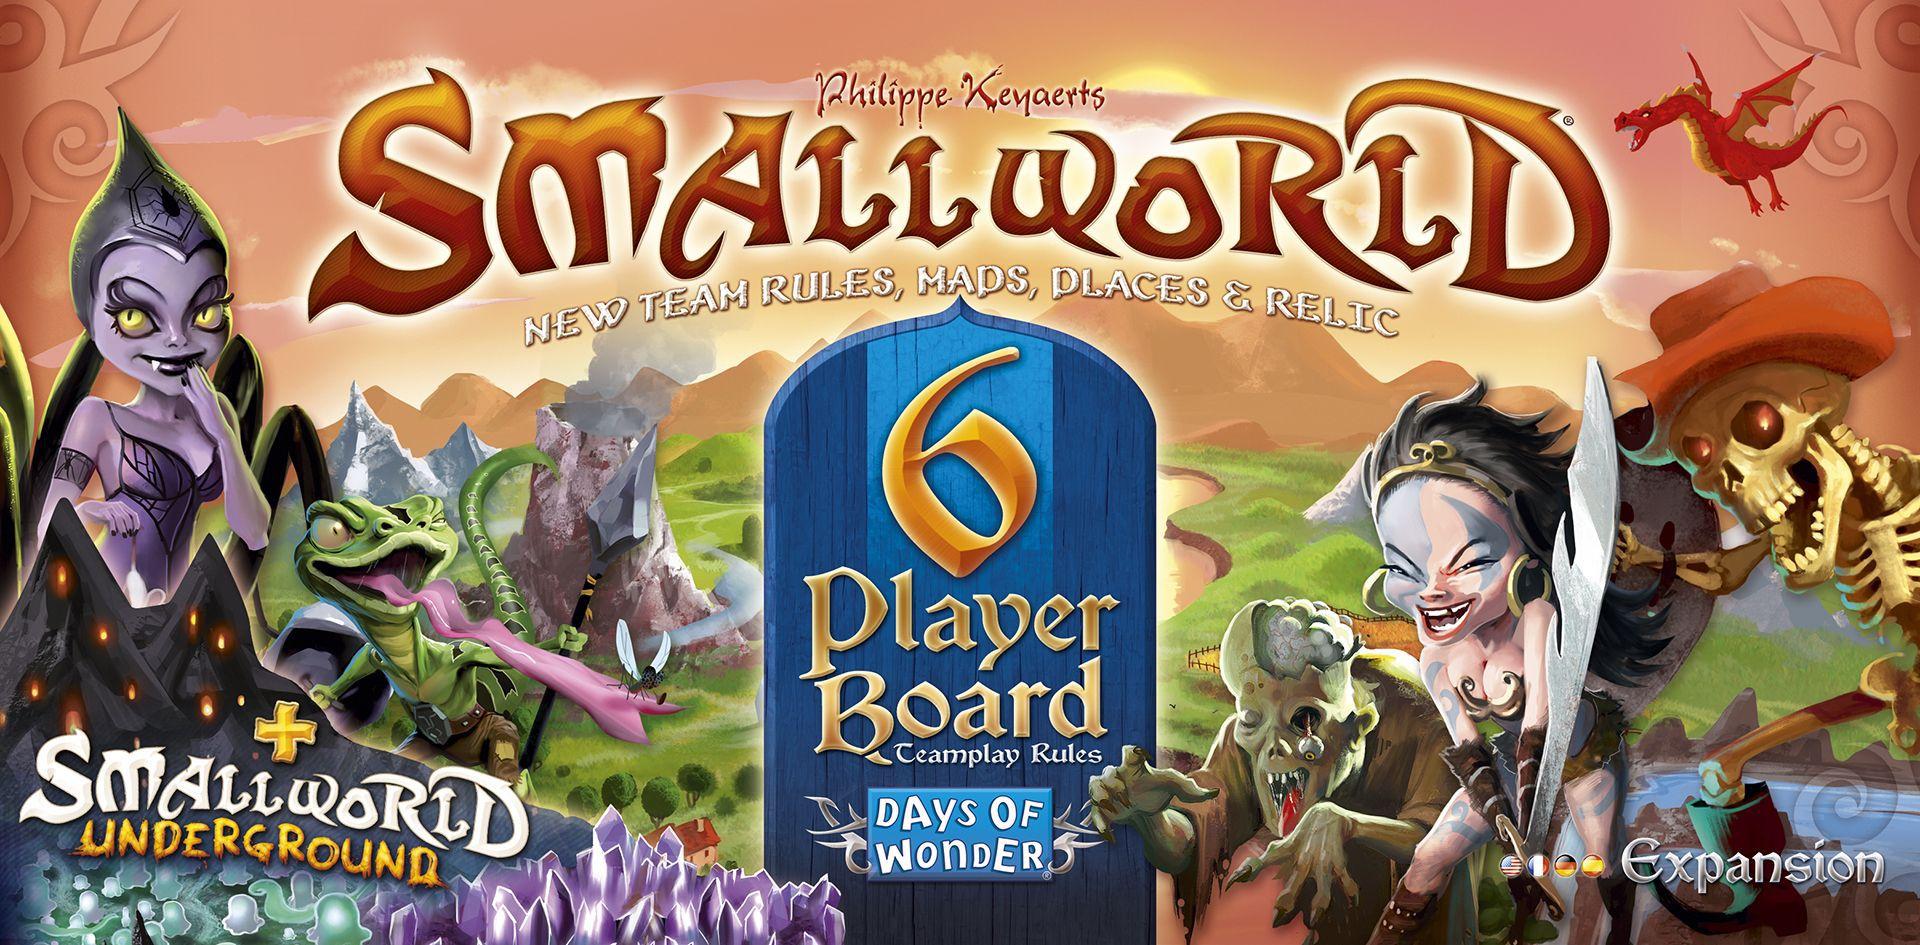 Small World: 6 Player Board